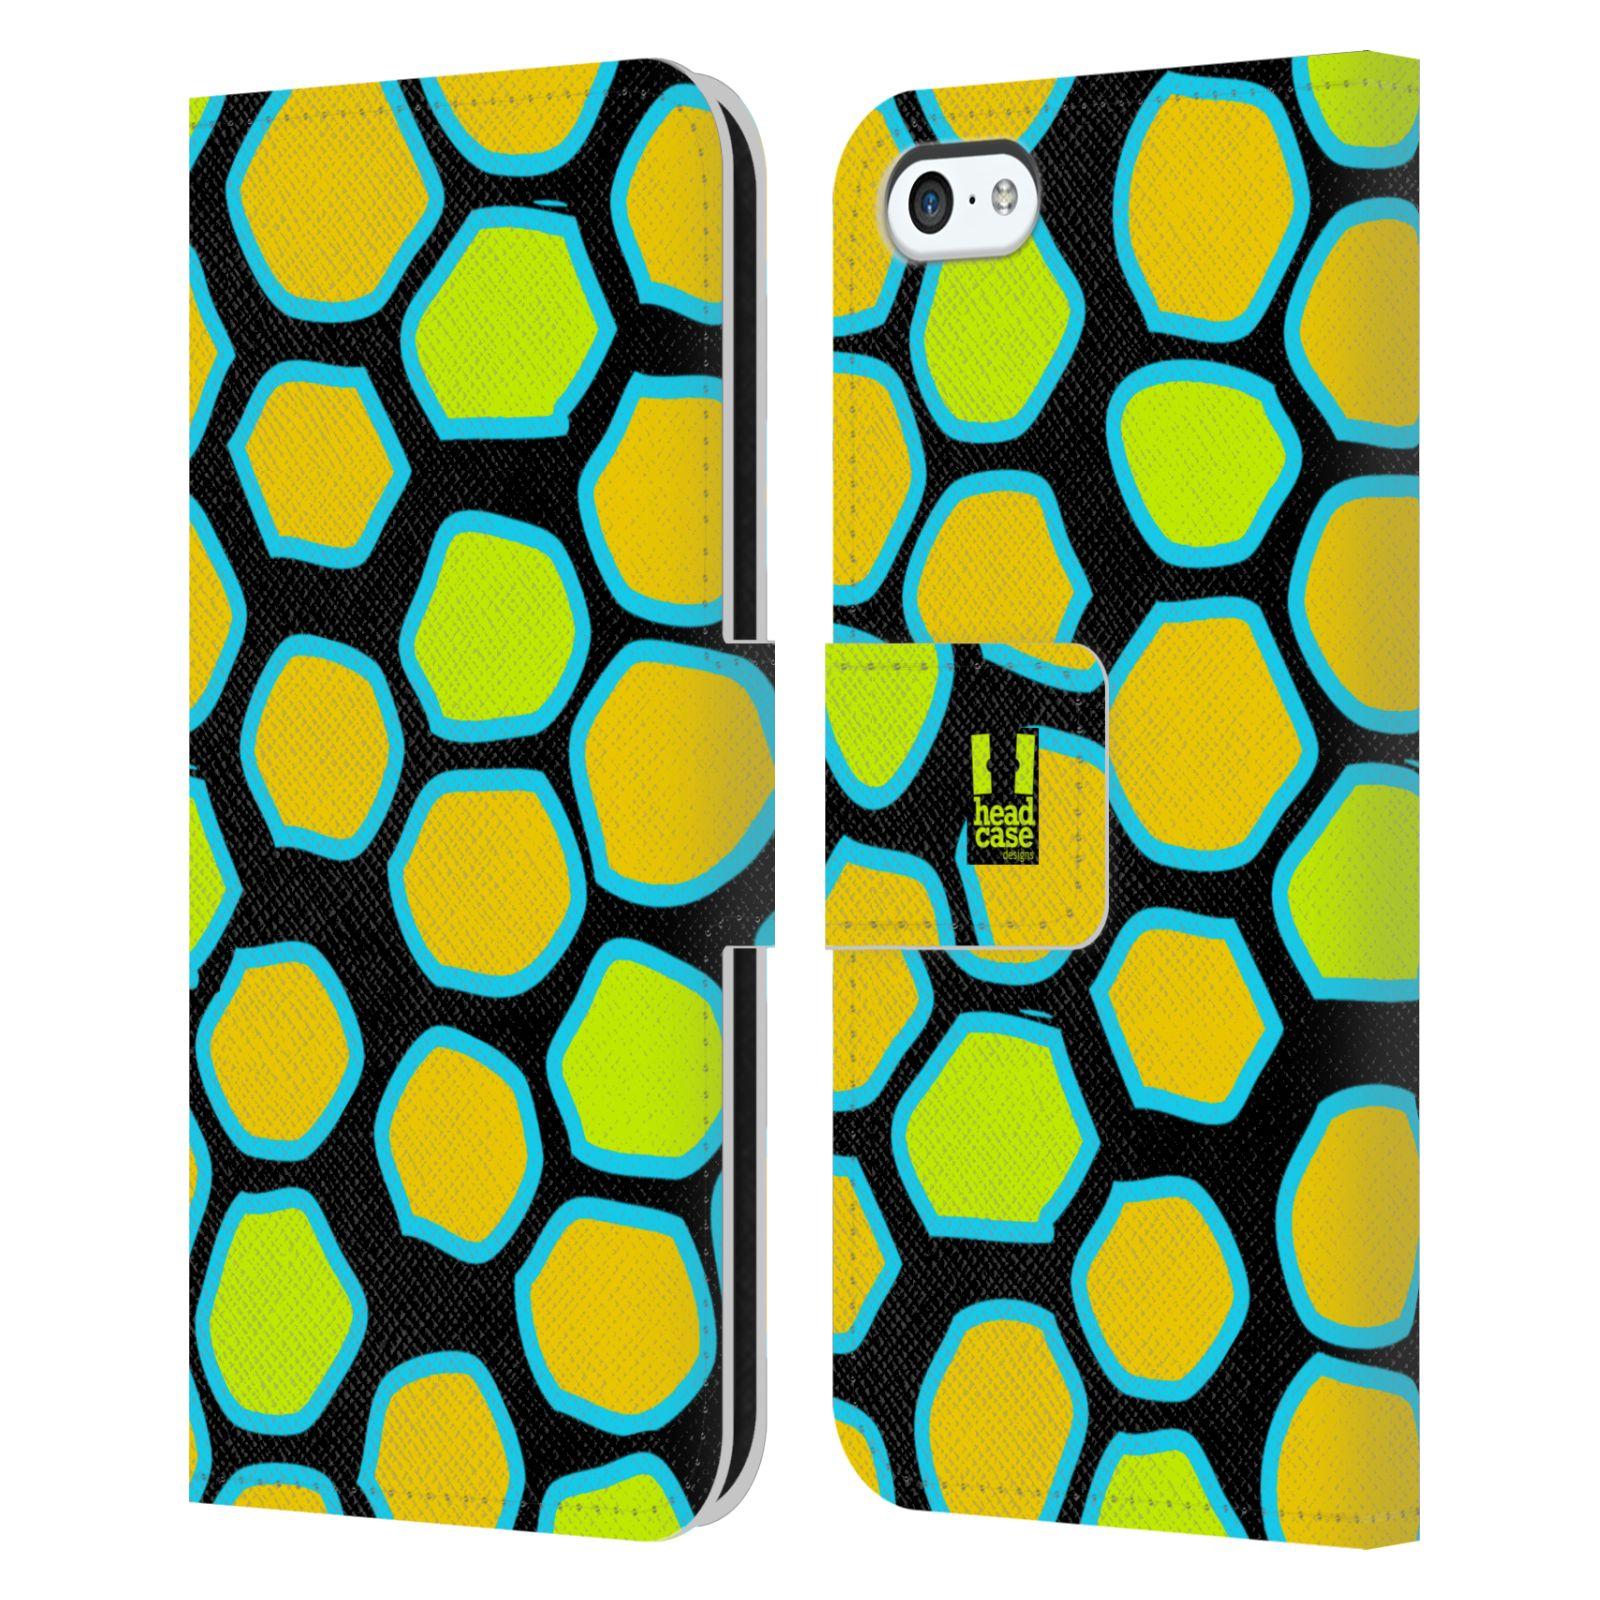 HEAD CASE Flipové pouzdro pro mobil Apple Iphone 5C Zvířecí barevné vzory žlutý had